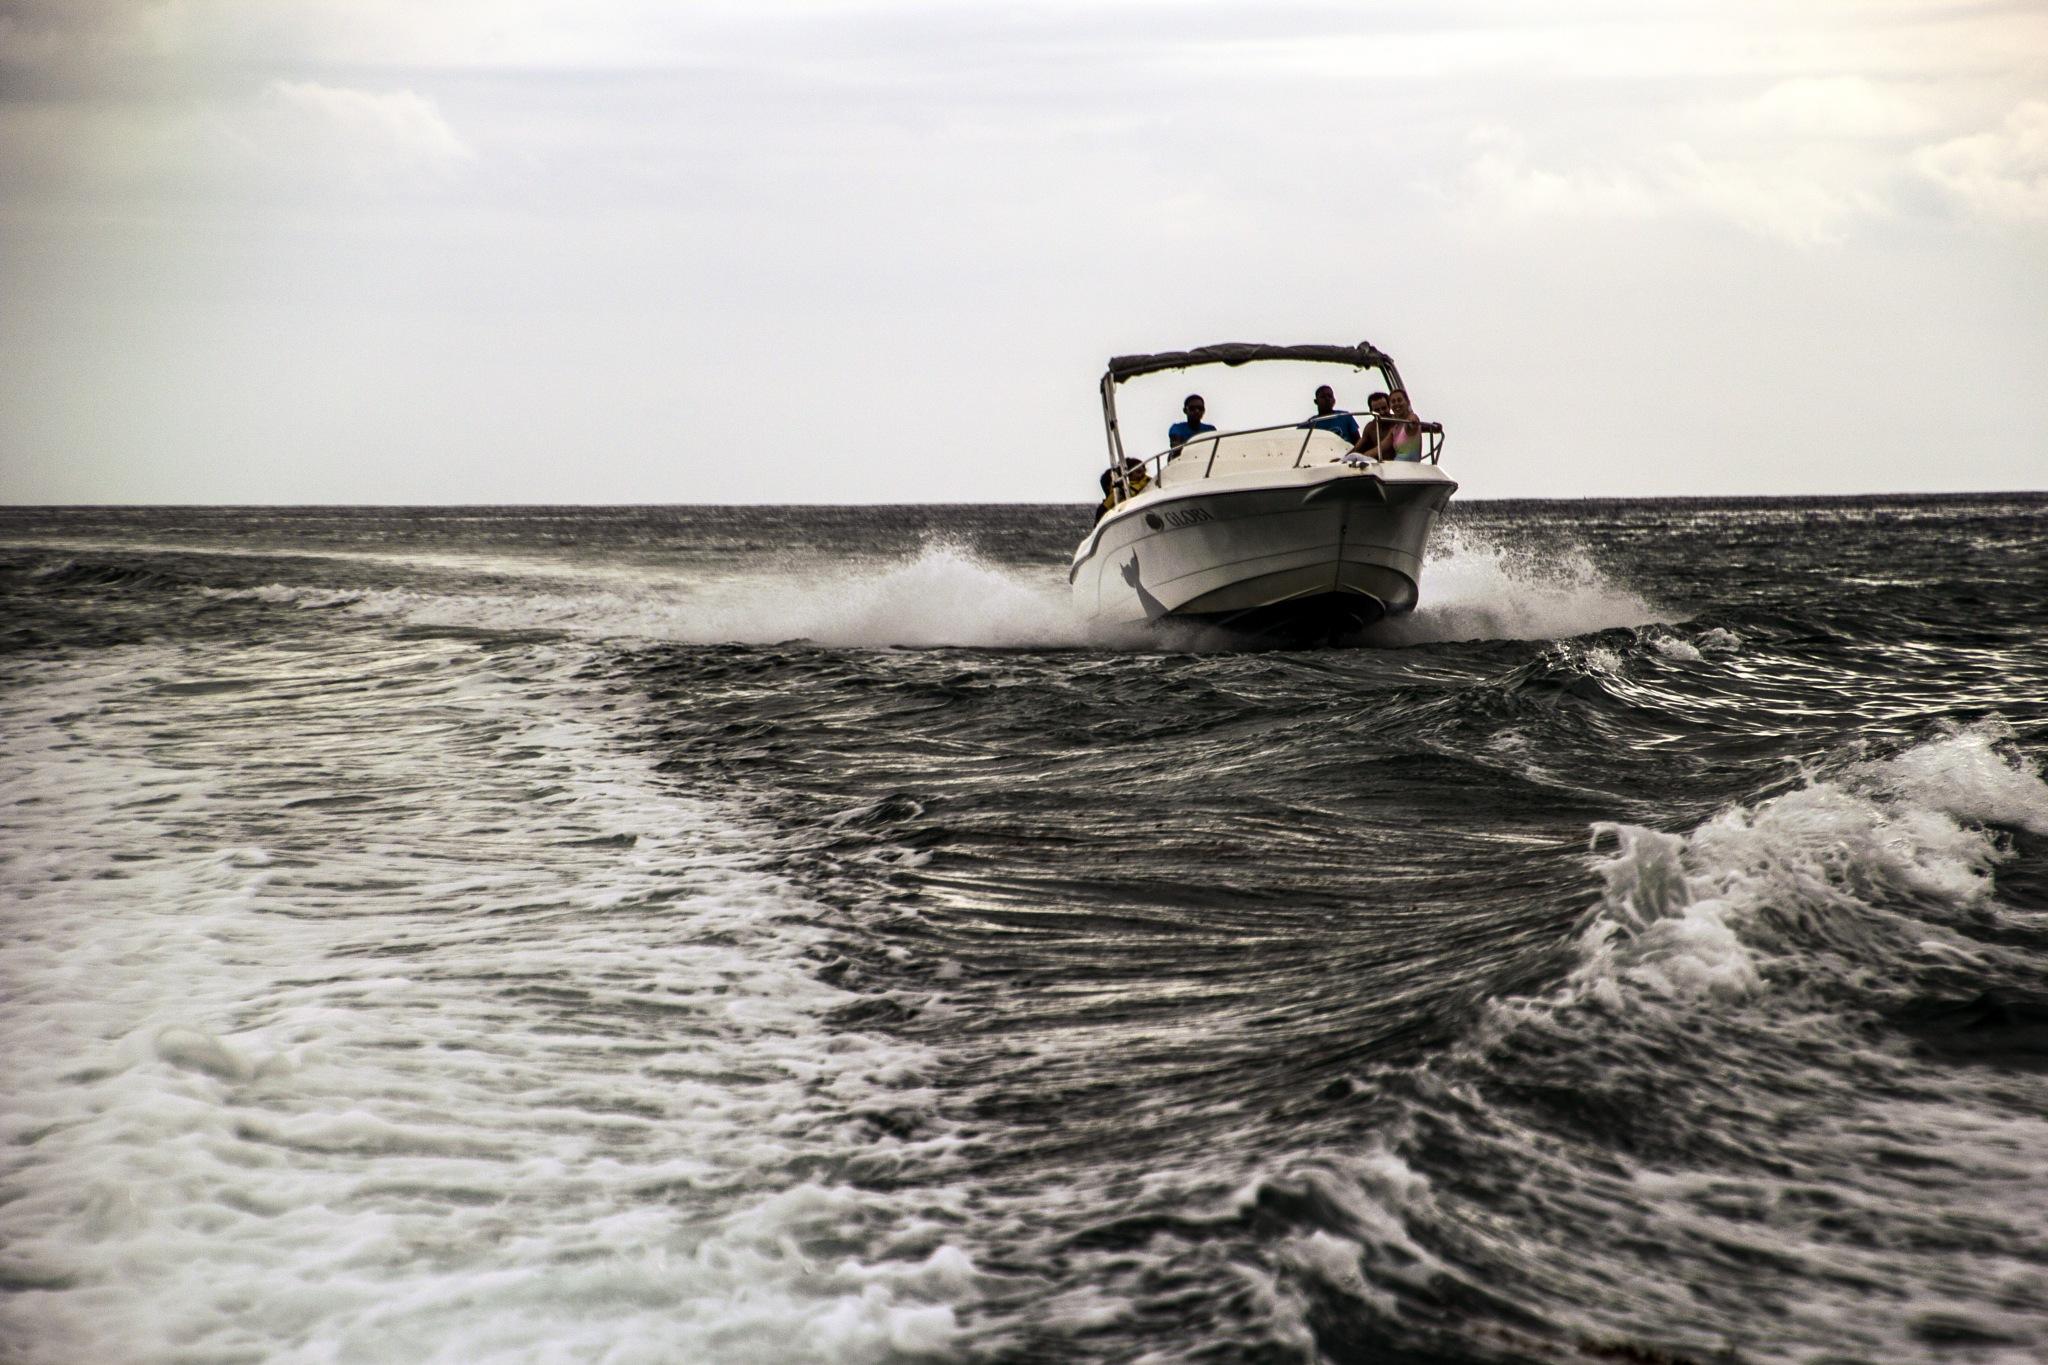 Riding the wake by Nauta Piscatorque